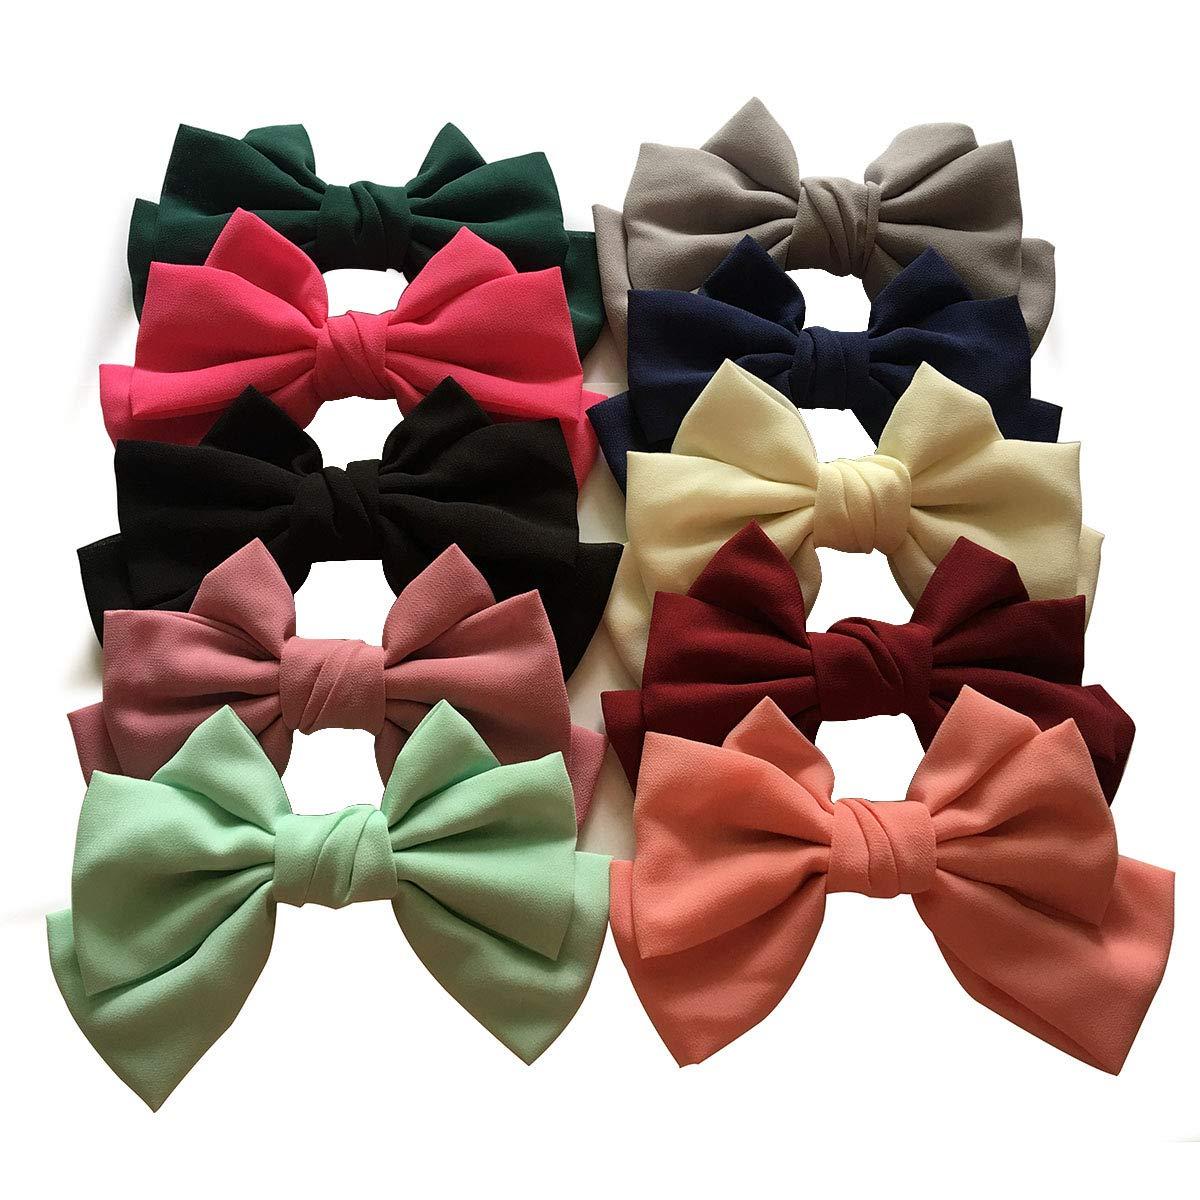 Yazon 10pcs Large Women Fashion Fabric Bows Hair Barrettes Adult Hair Bows Clips …